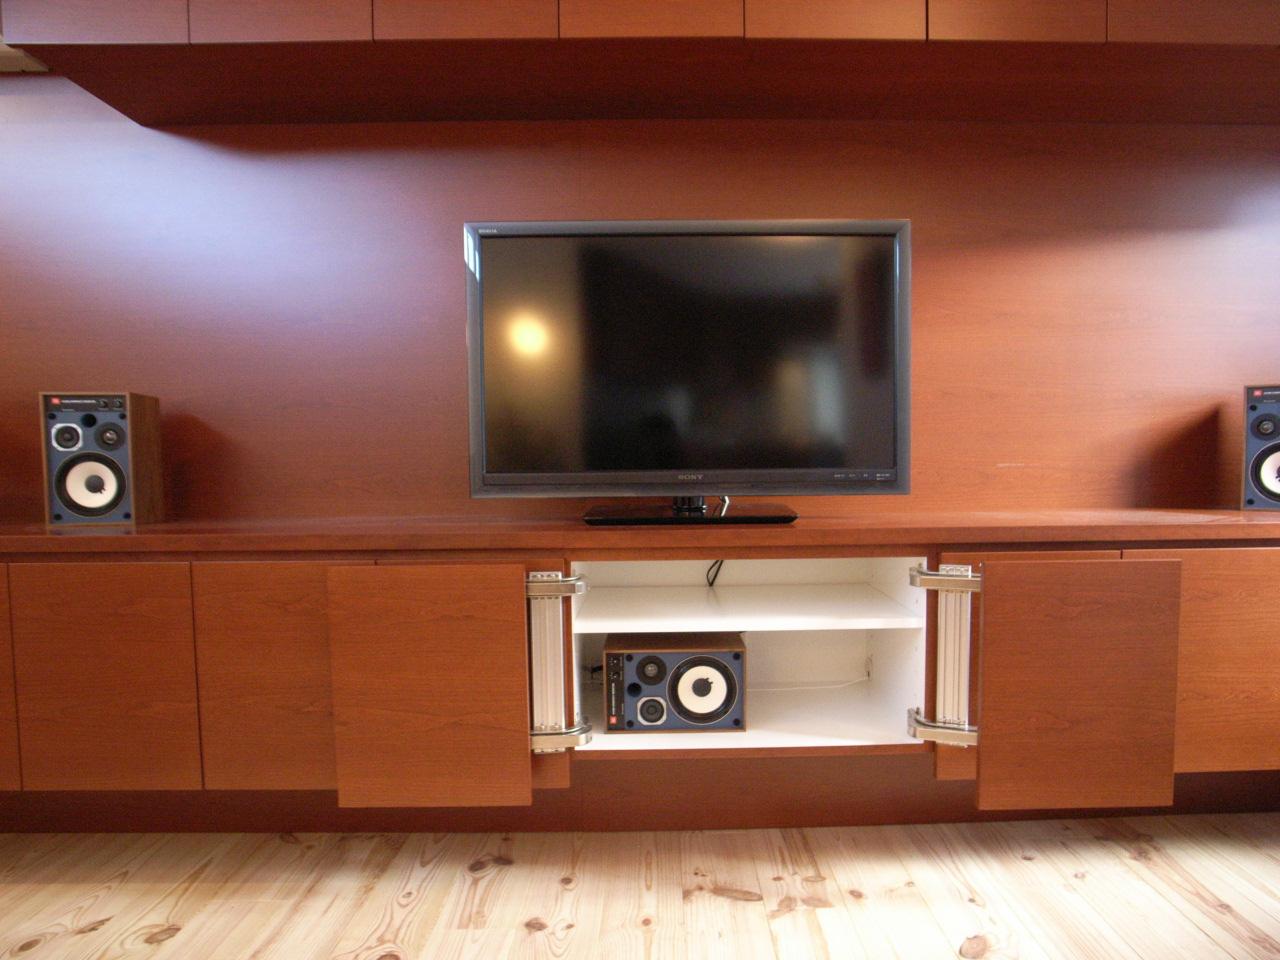 wall unit tv board. Black Bedroom Furniture Sets. Home Design Ideas